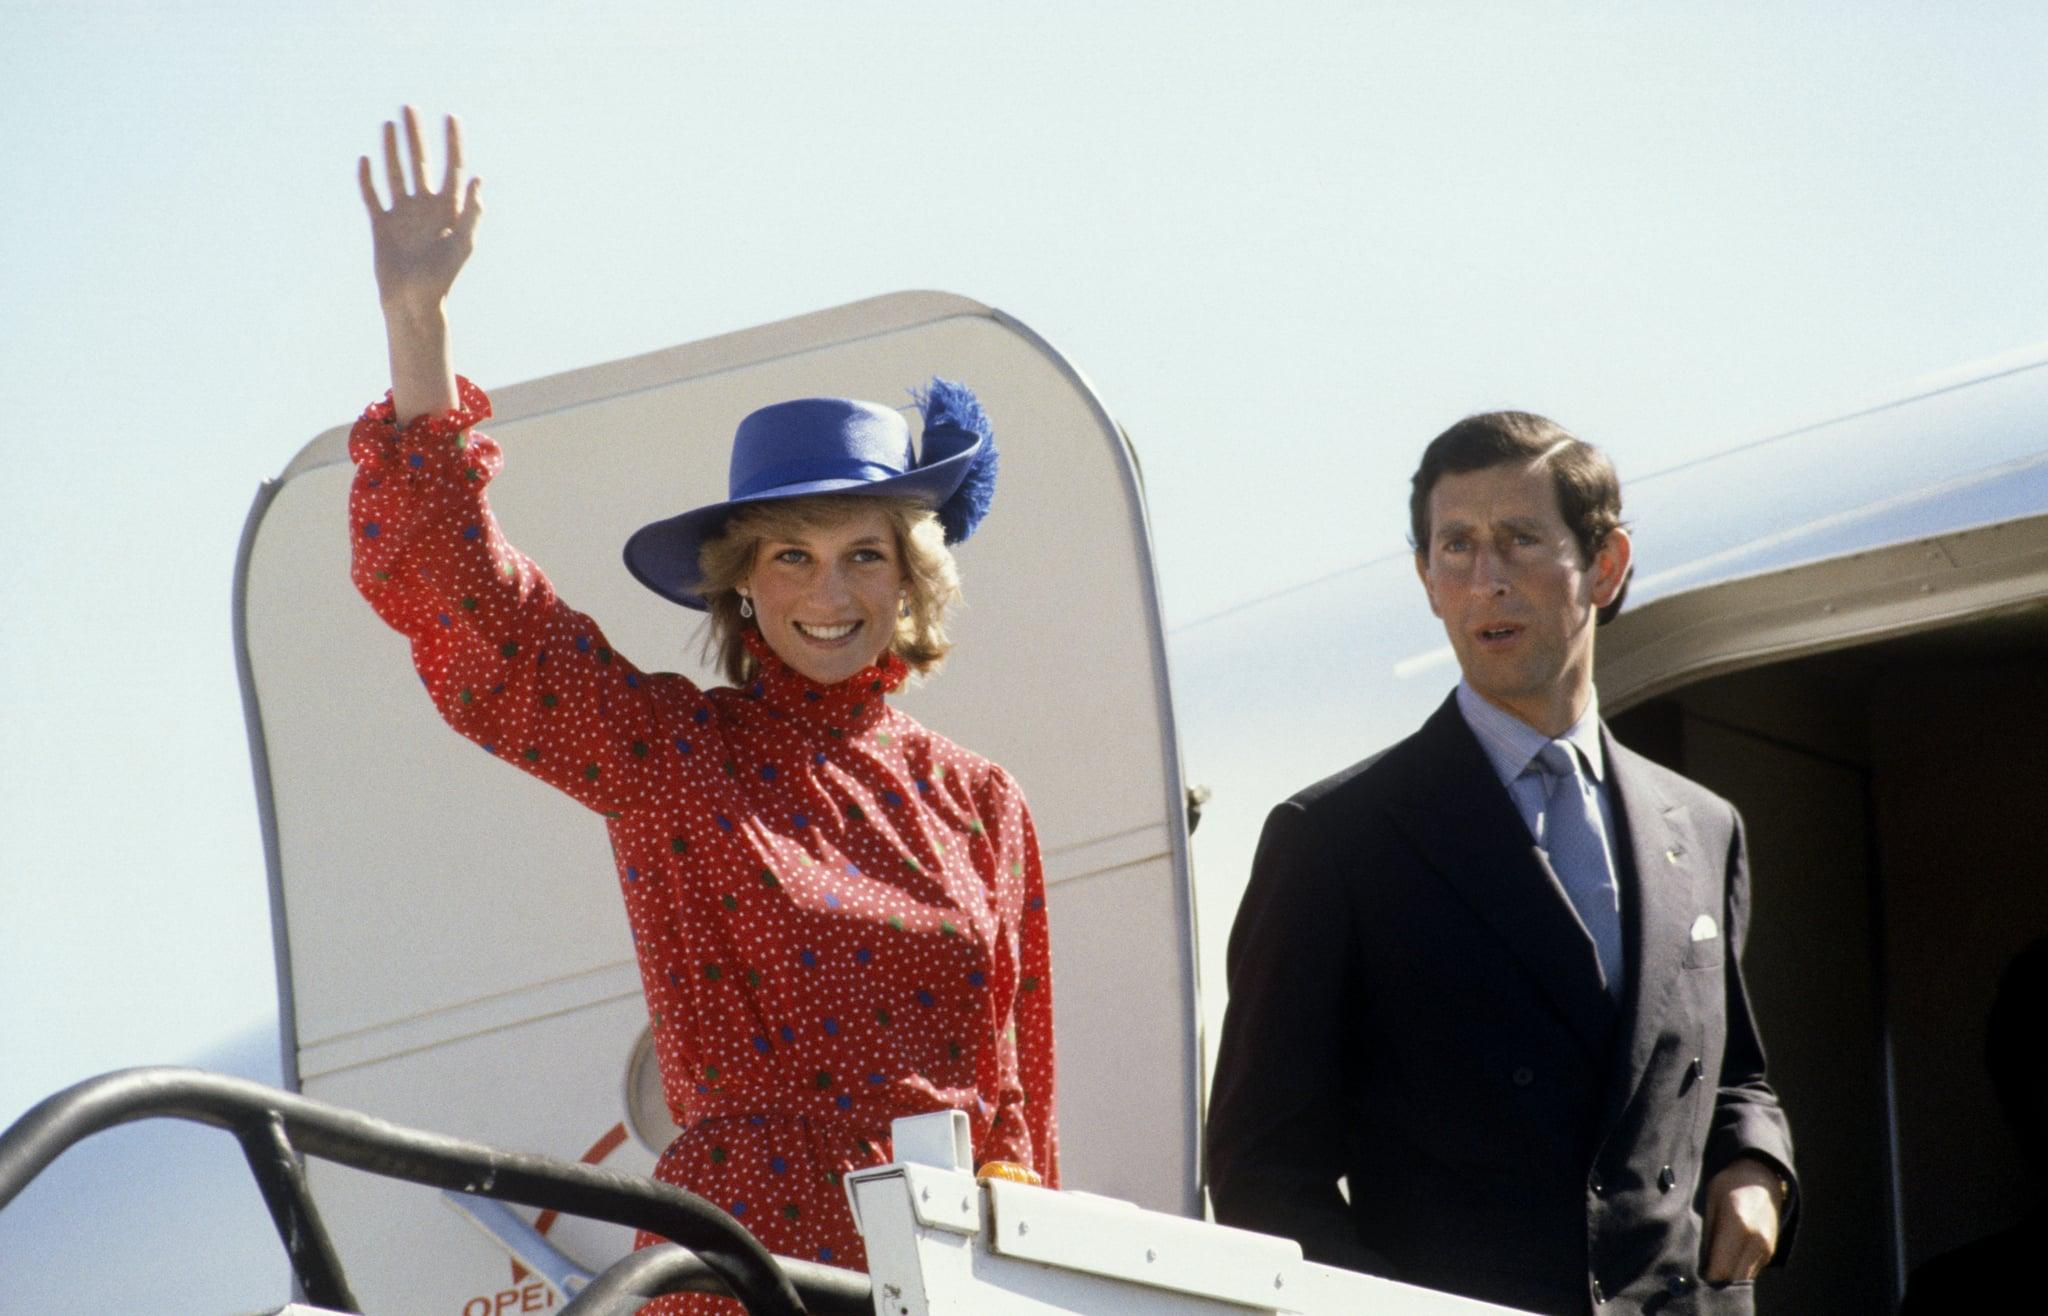 prince charles and princess diana s australia tour pictures popsugar celebrity prince charles and princess diana s